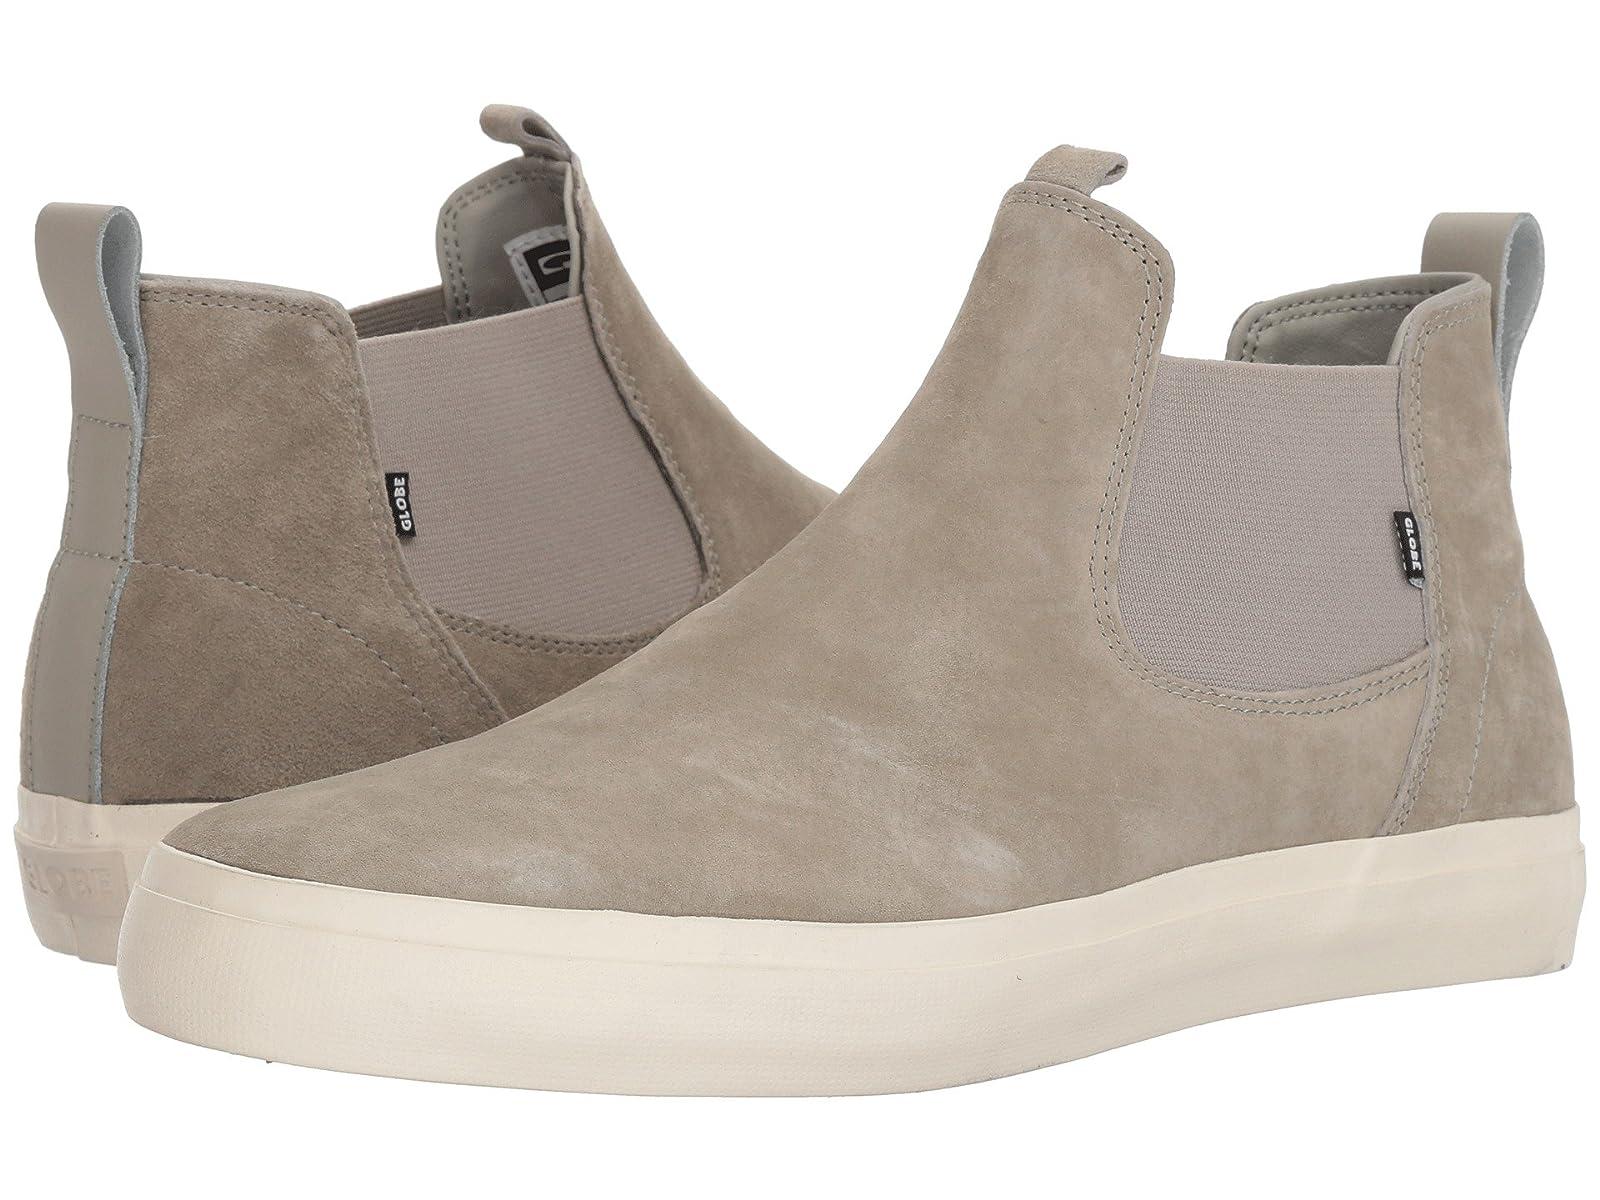 Globe DoverCheap and distinctive eye-catching shoes